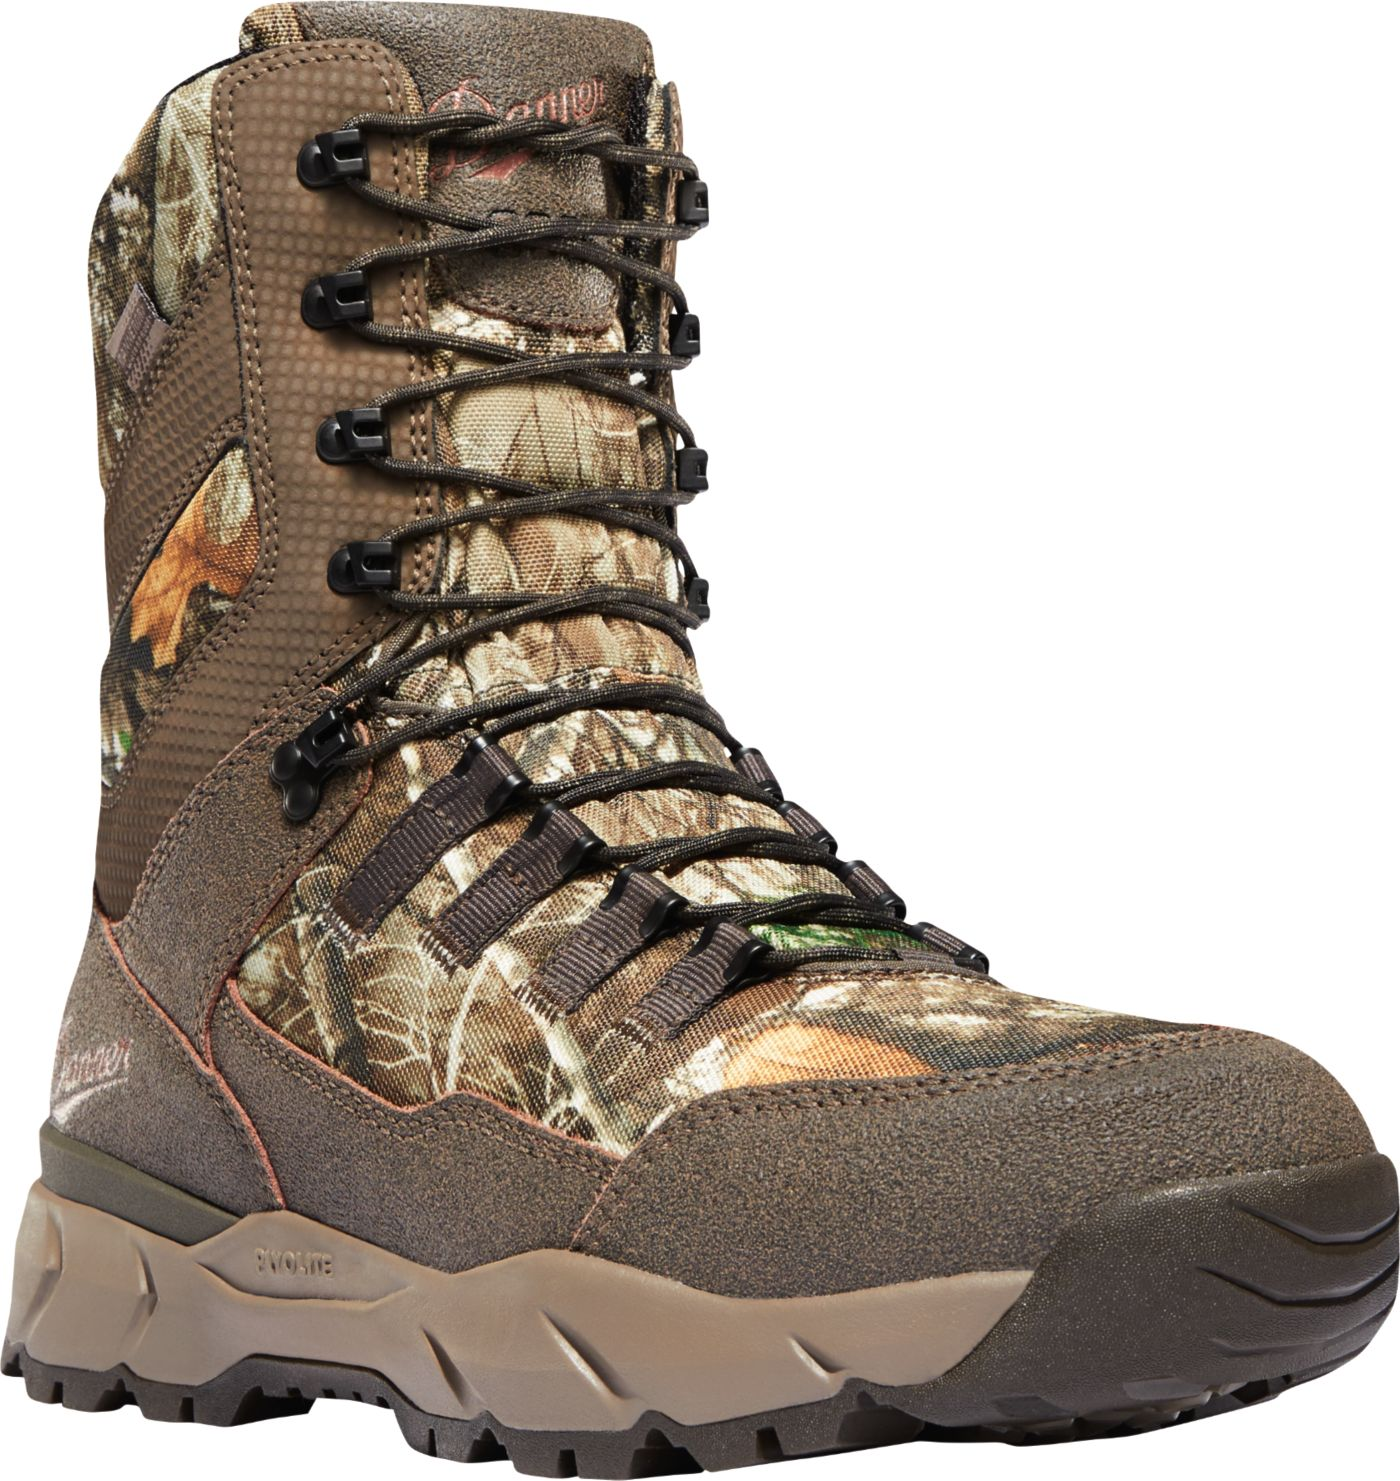 "Danner Men's Vital 8"" Realtree Edge 800g Waterproof Hunting Boots"